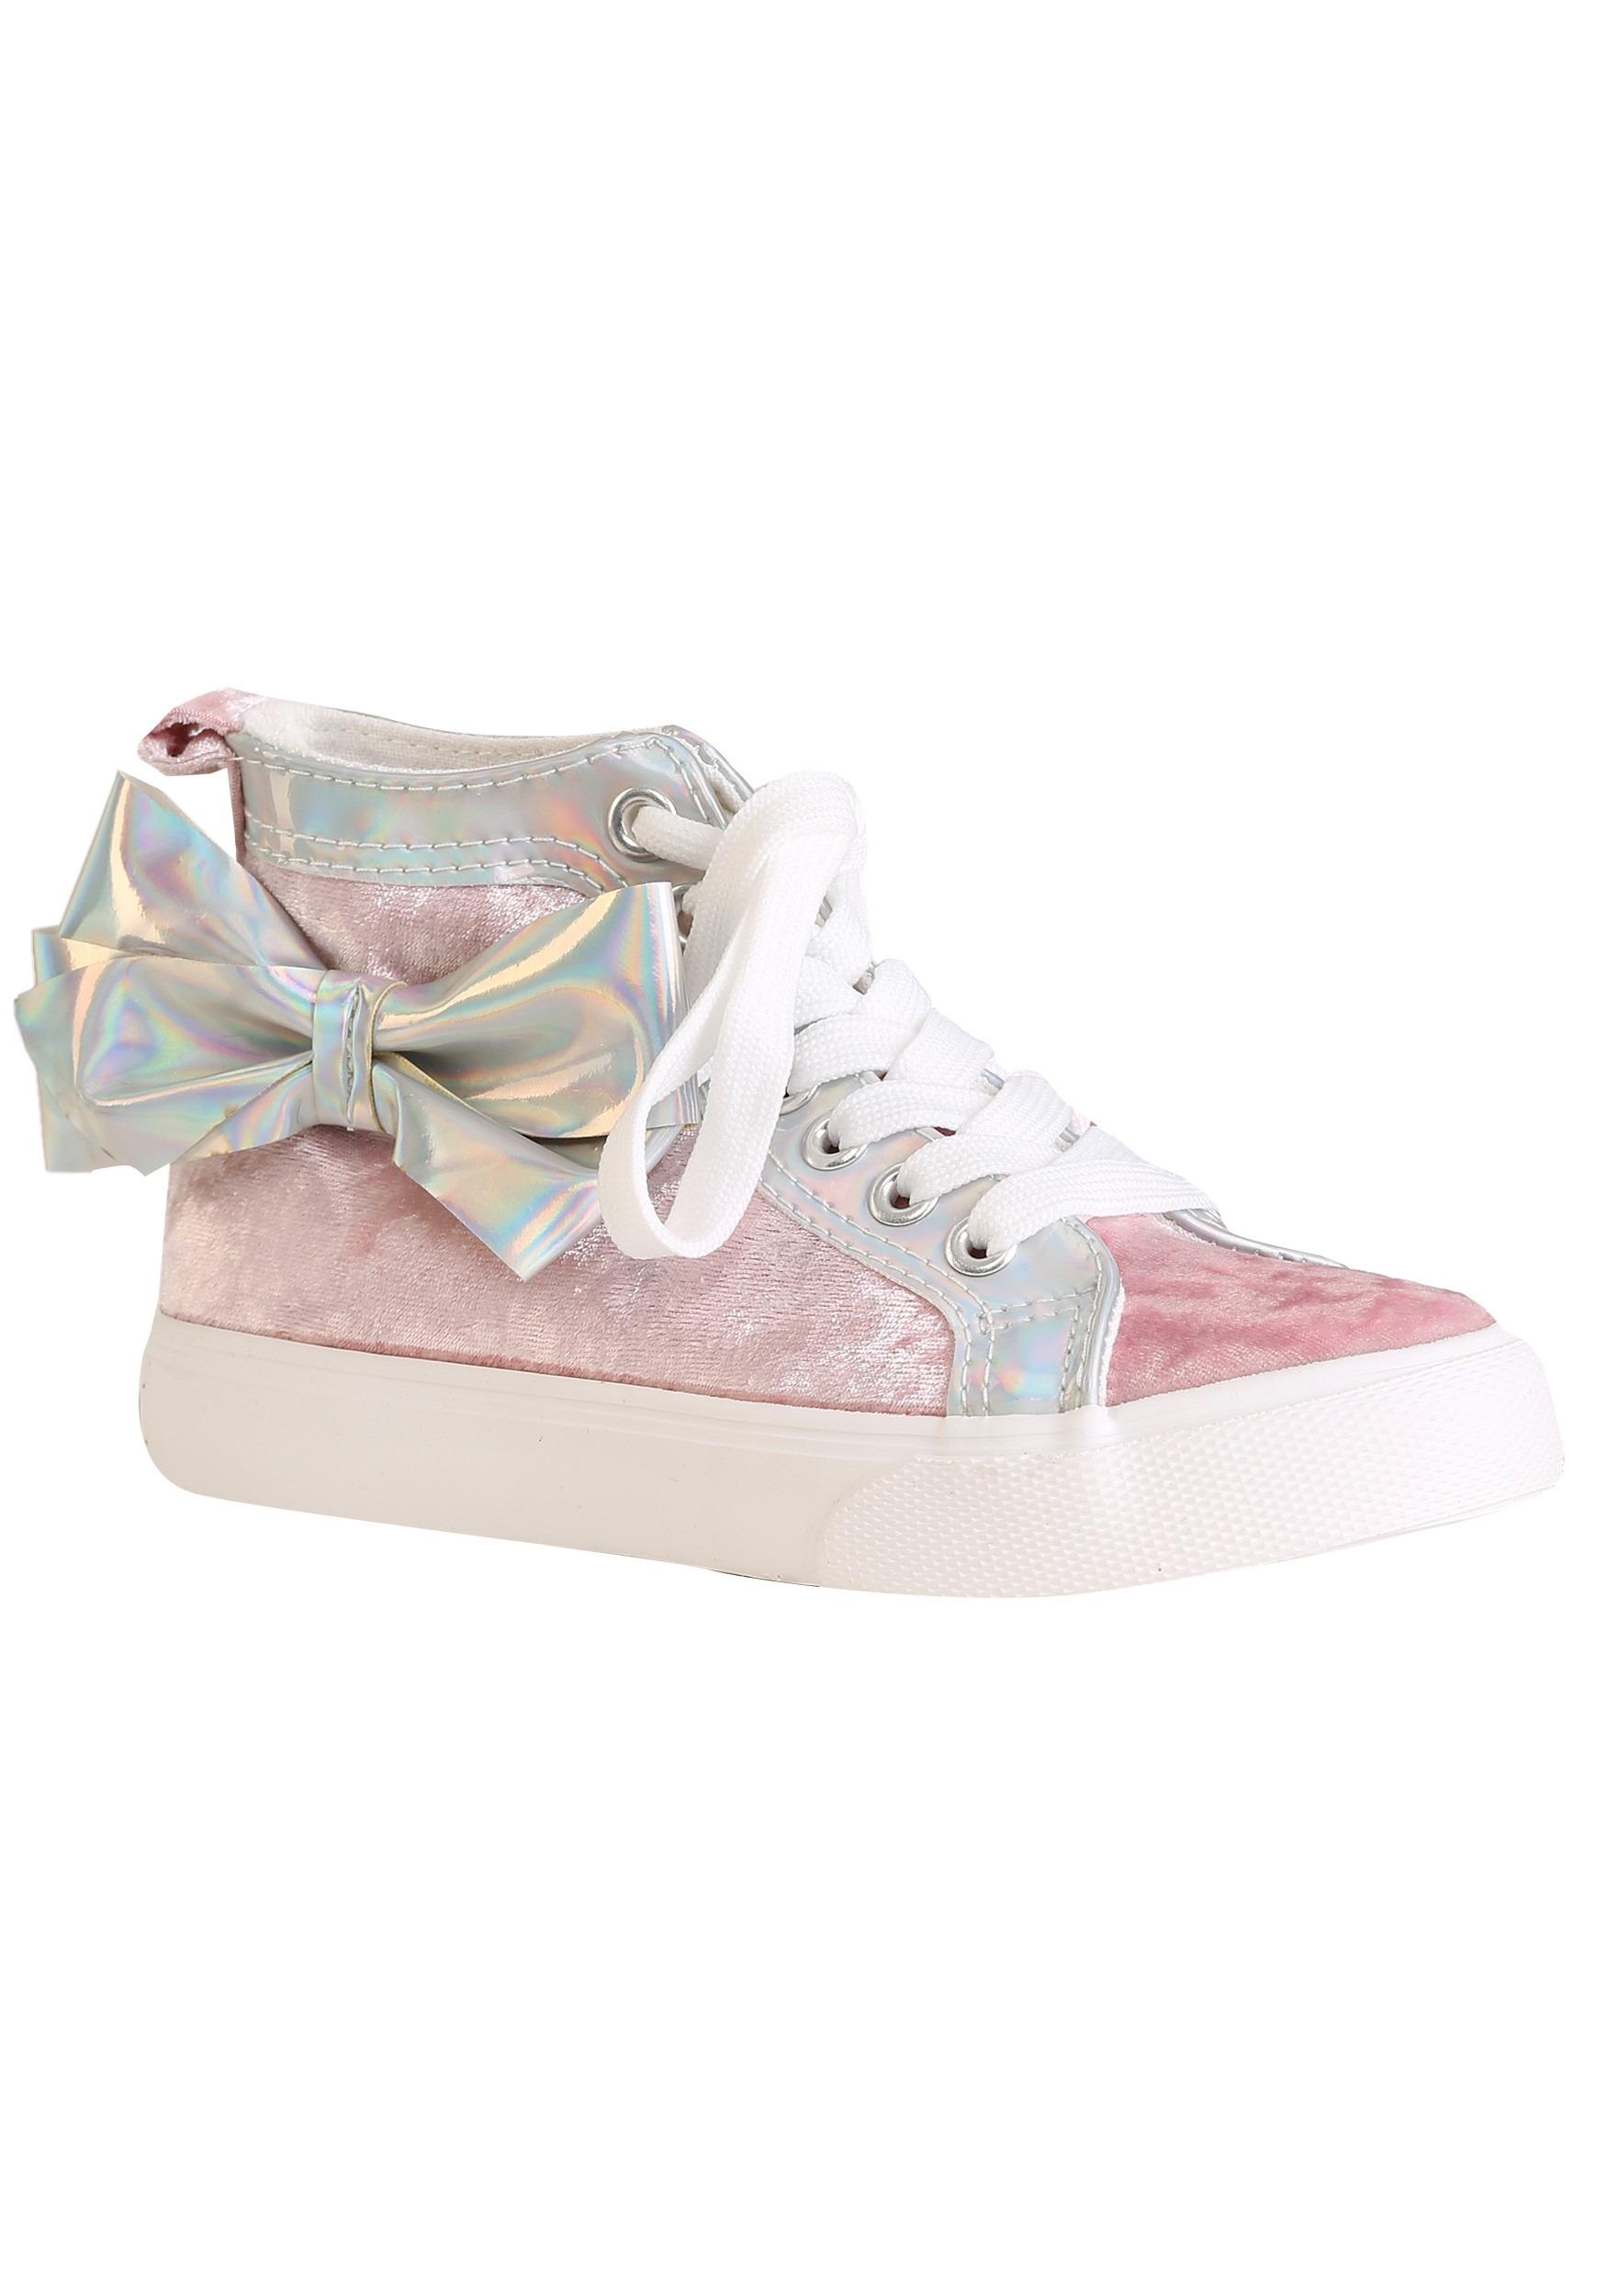 JoJo Siwa Pink High Top Sneakers w/ Bow for Girls